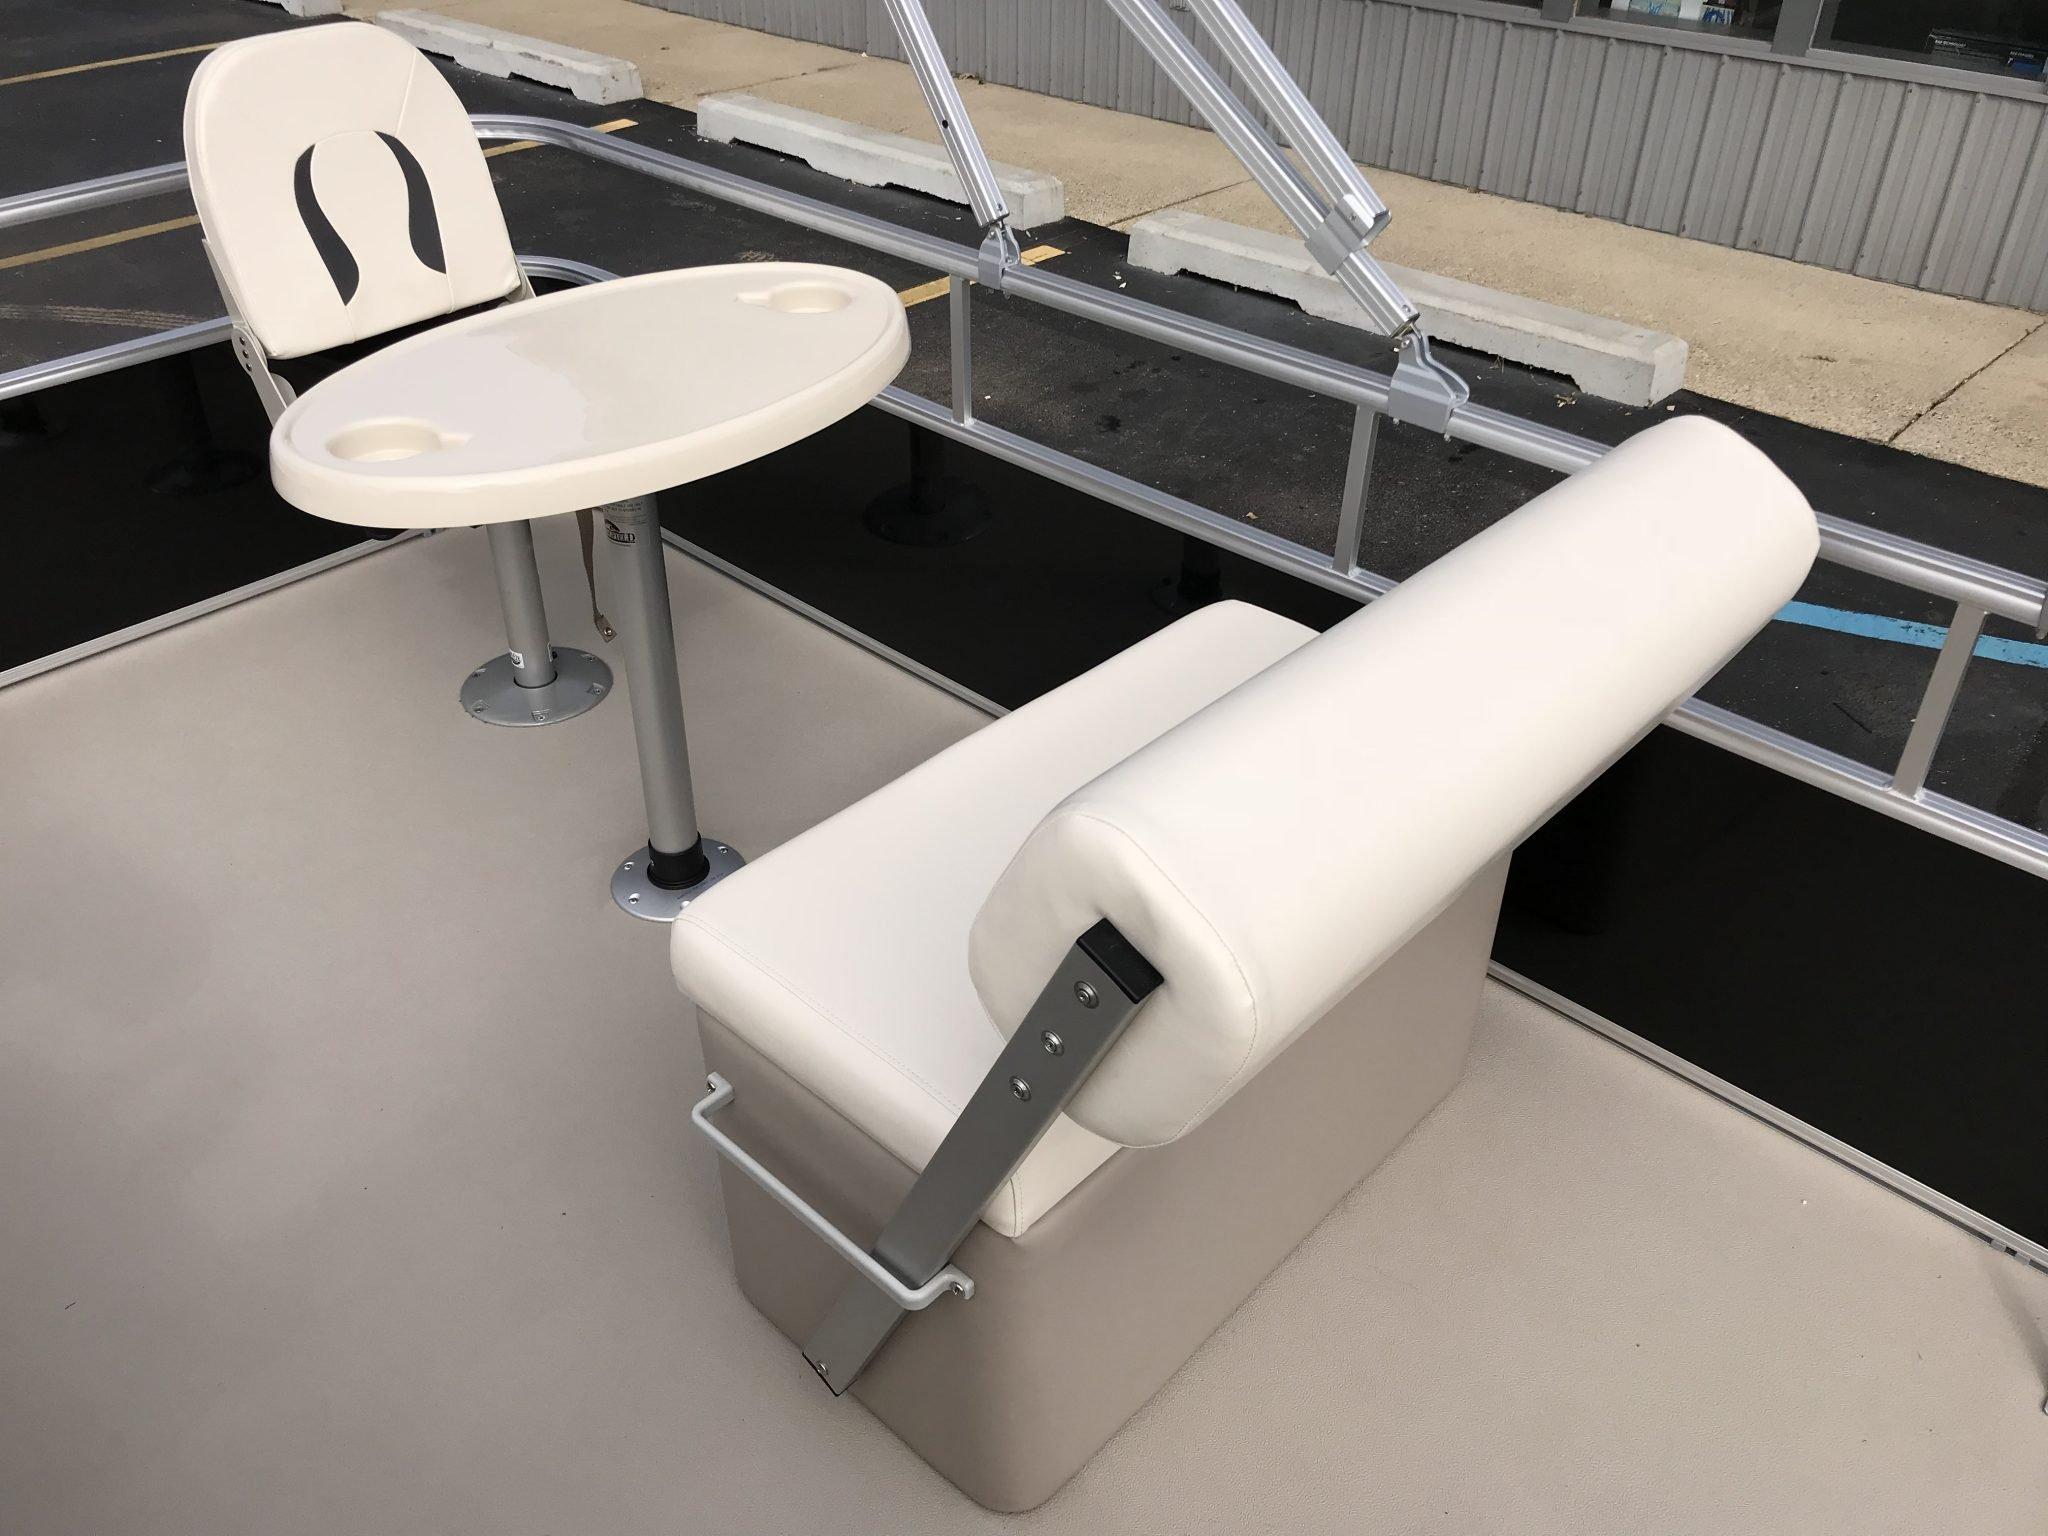 2019 SunChaser 818 4.0 Interior Flip-Flop Seating